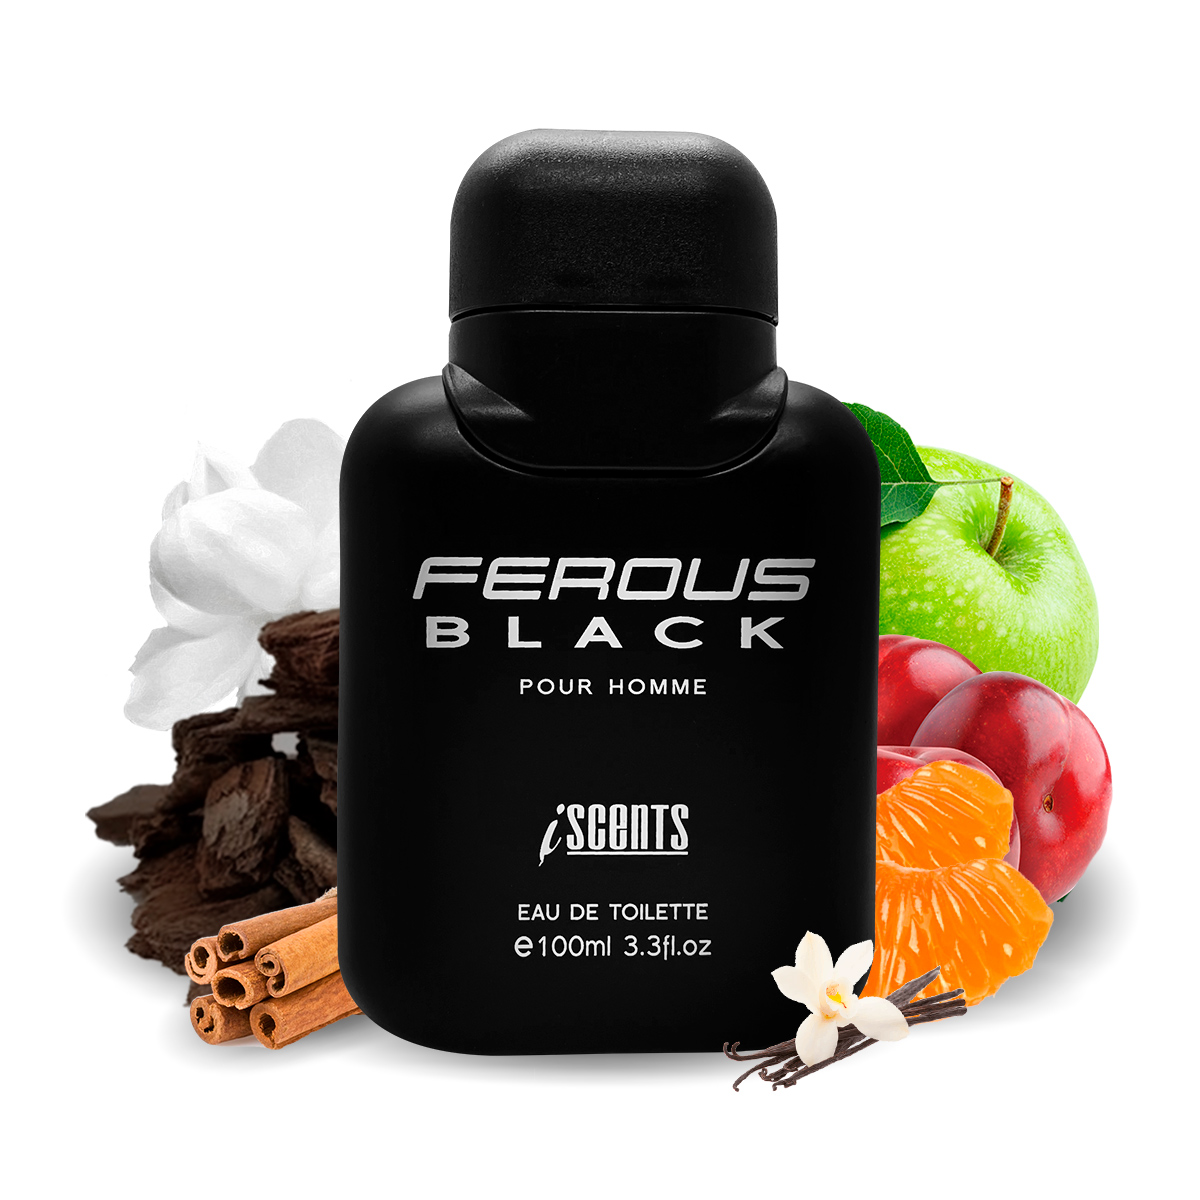 Kit 2 Perfumes Importados Fantasia e Ferous Black I Scents  - Mercari Perfumes